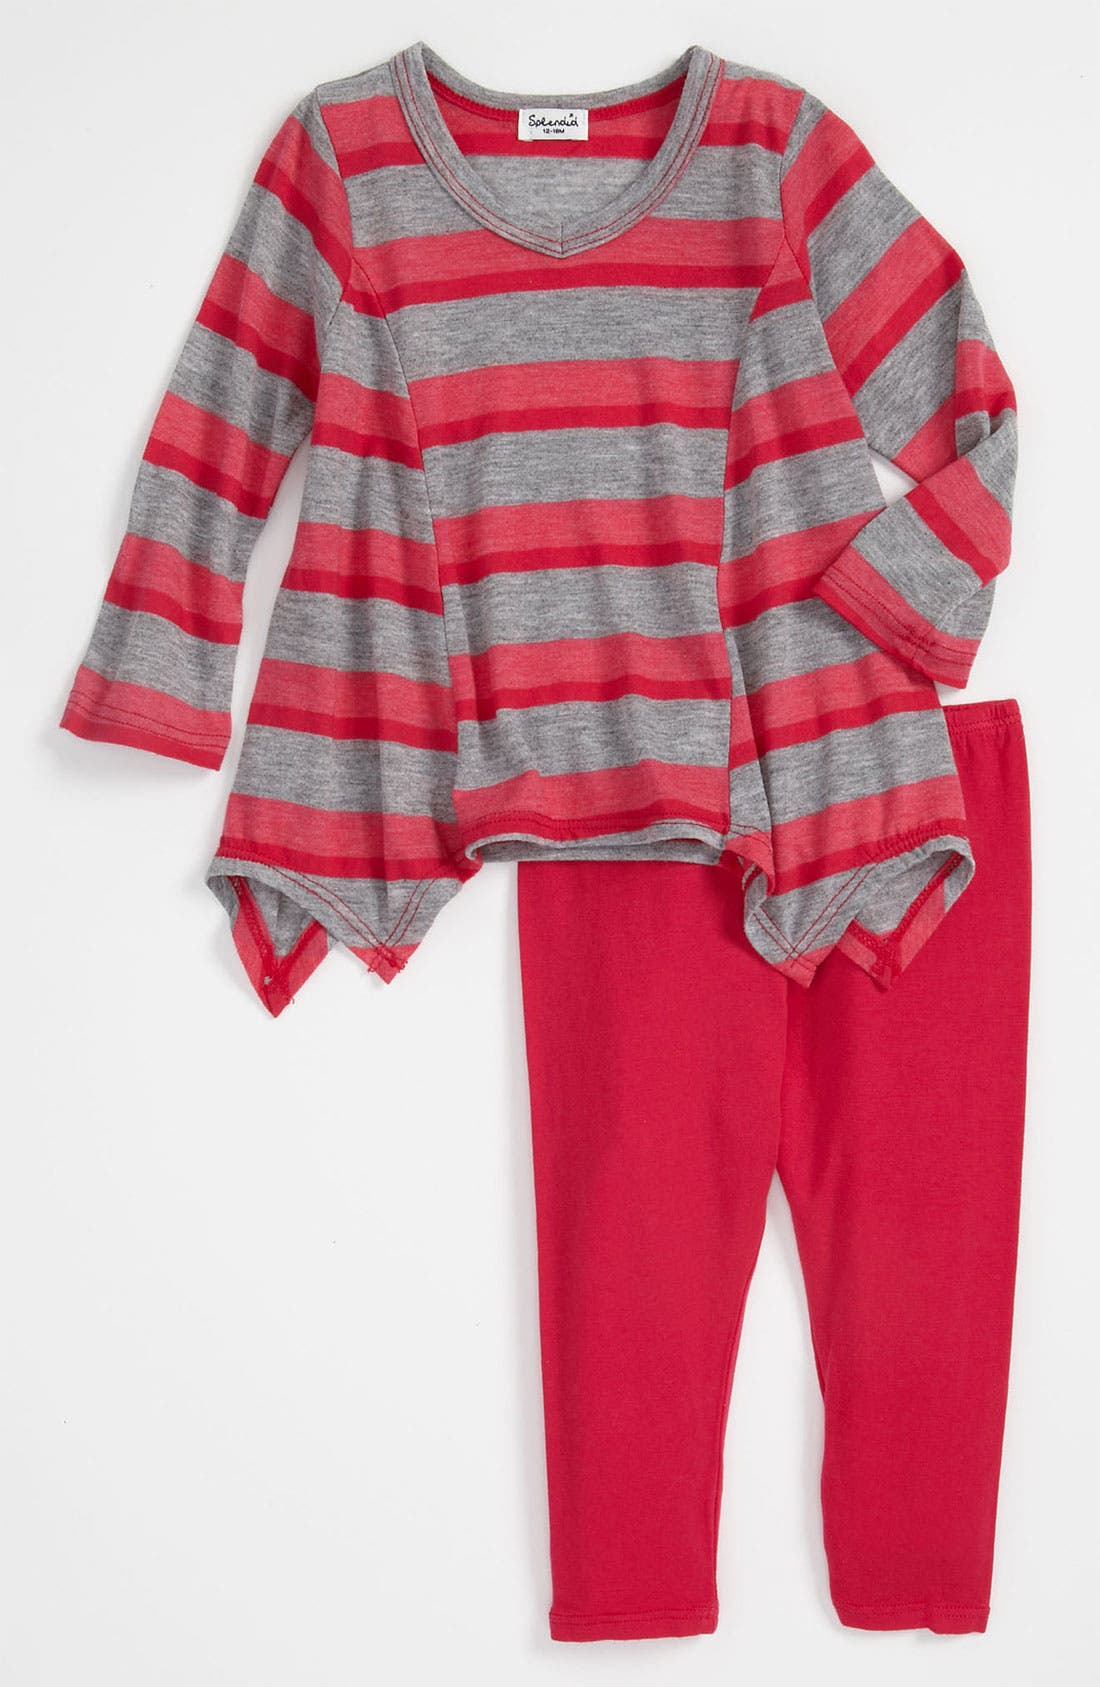 Main Image - Splendid 'Lily' Stripe Tunic & Leggings (Infant)